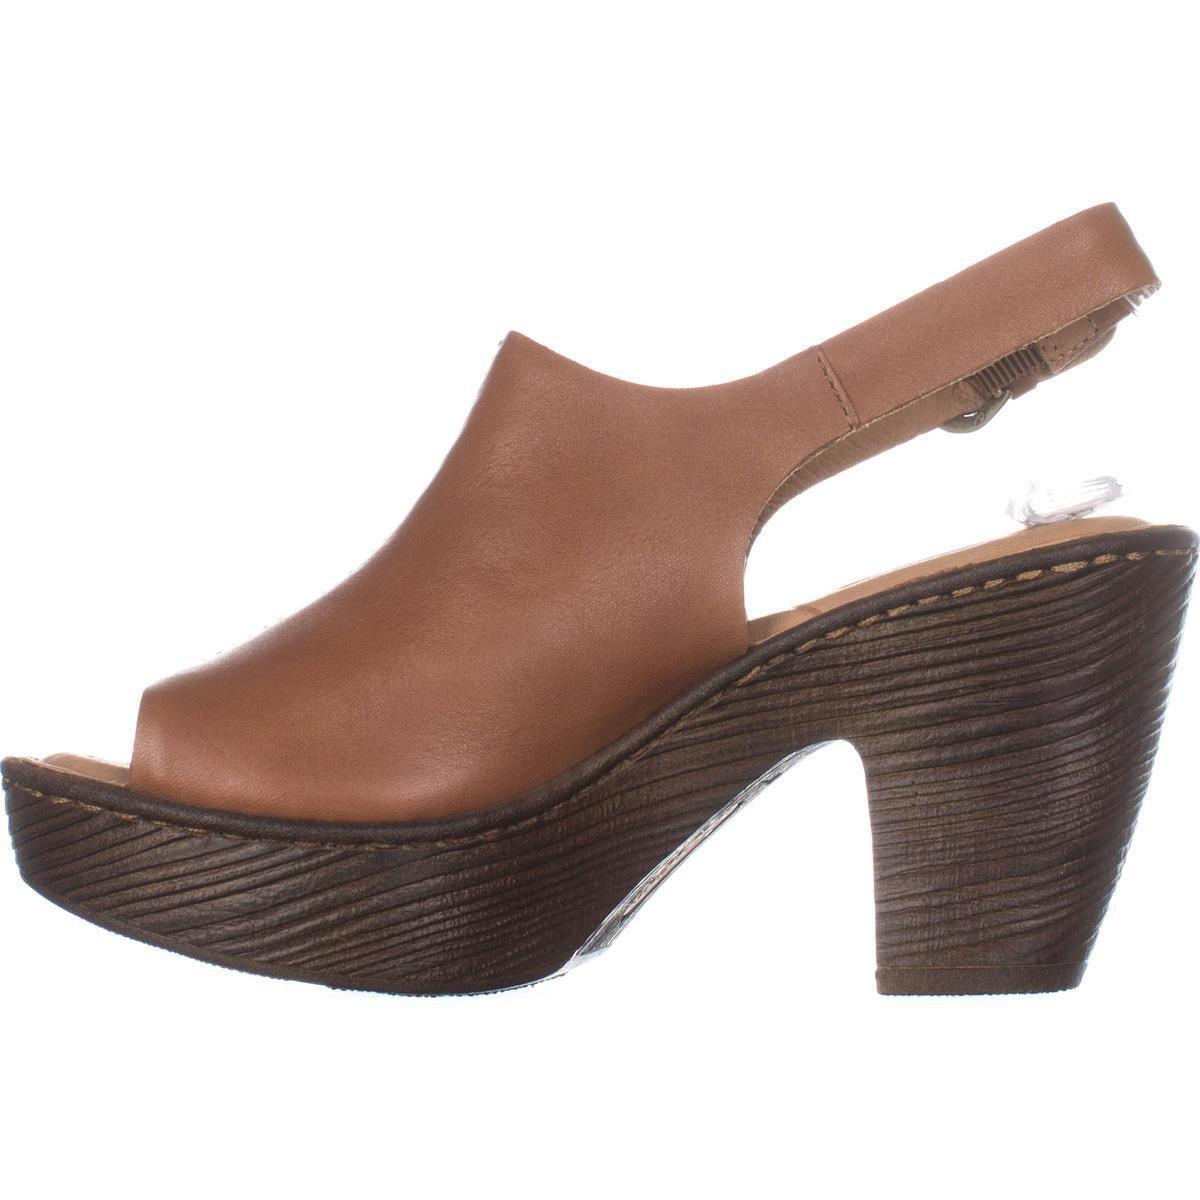 d5671dcc0be5 Lyst - Born Fatema Platform Sandals in Brown